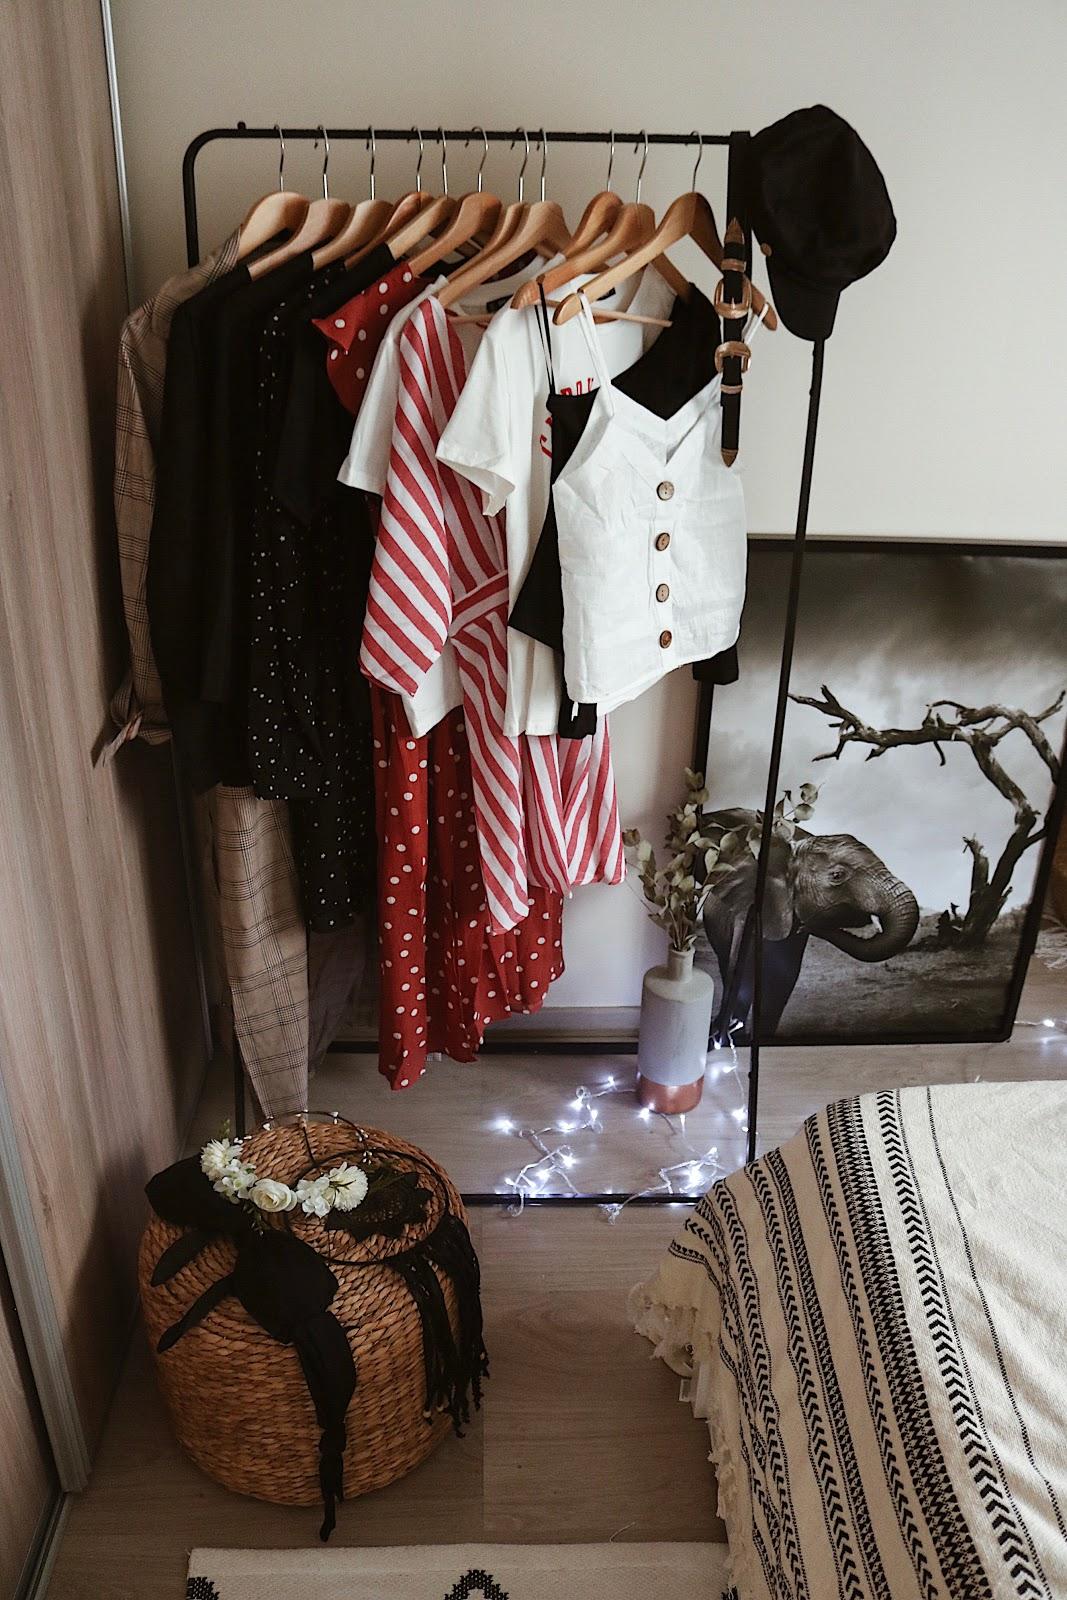 shein avis et gros haul pauline dress blog mode lifestyle et d co besan on. Black Bedroom Furniture Sets. Home Design Ideas